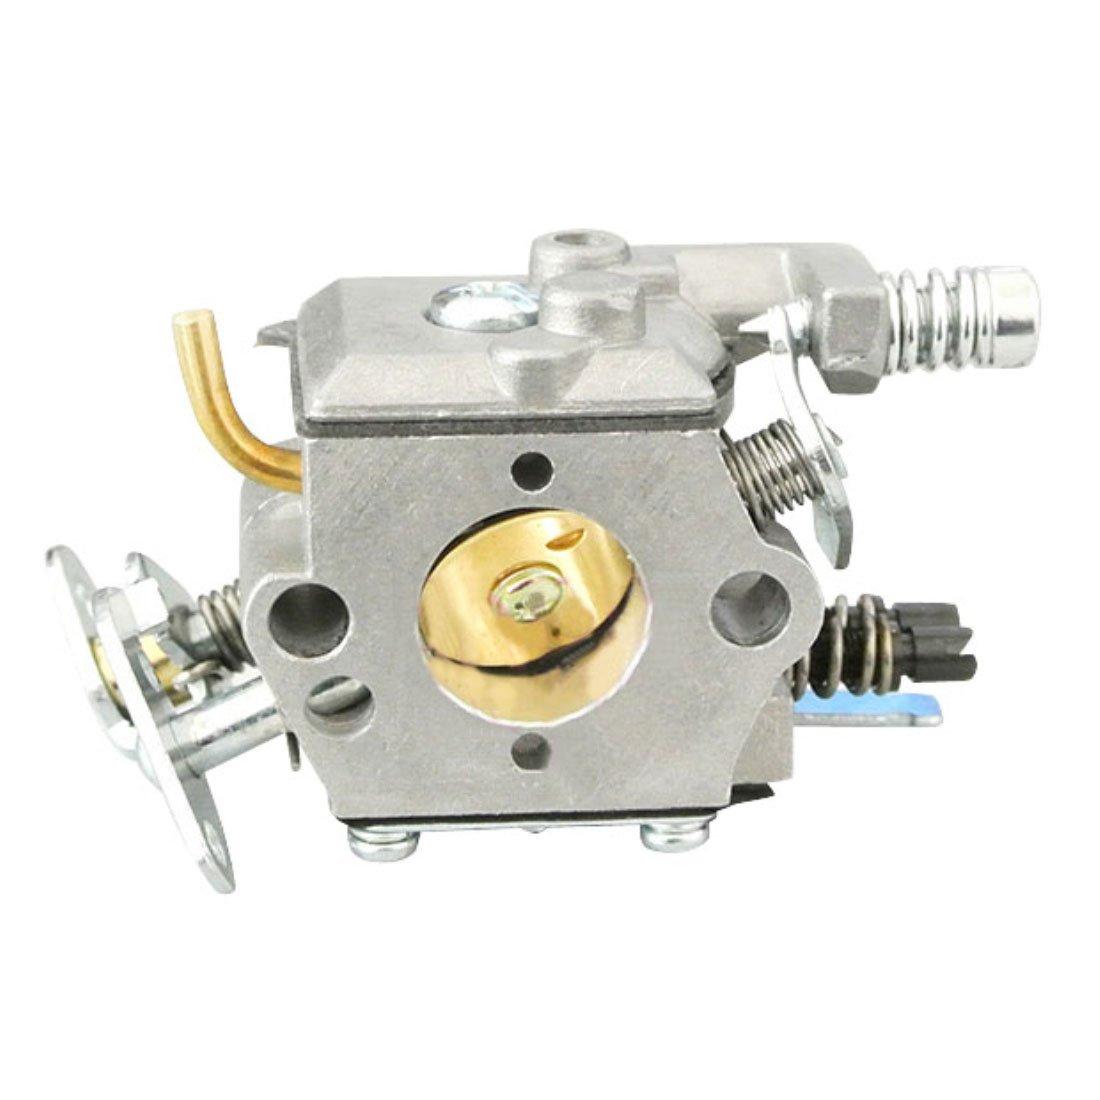 New Chainsaw Husqvarna 136 137 141 142 Motor Engine Carburetor Carb Parts